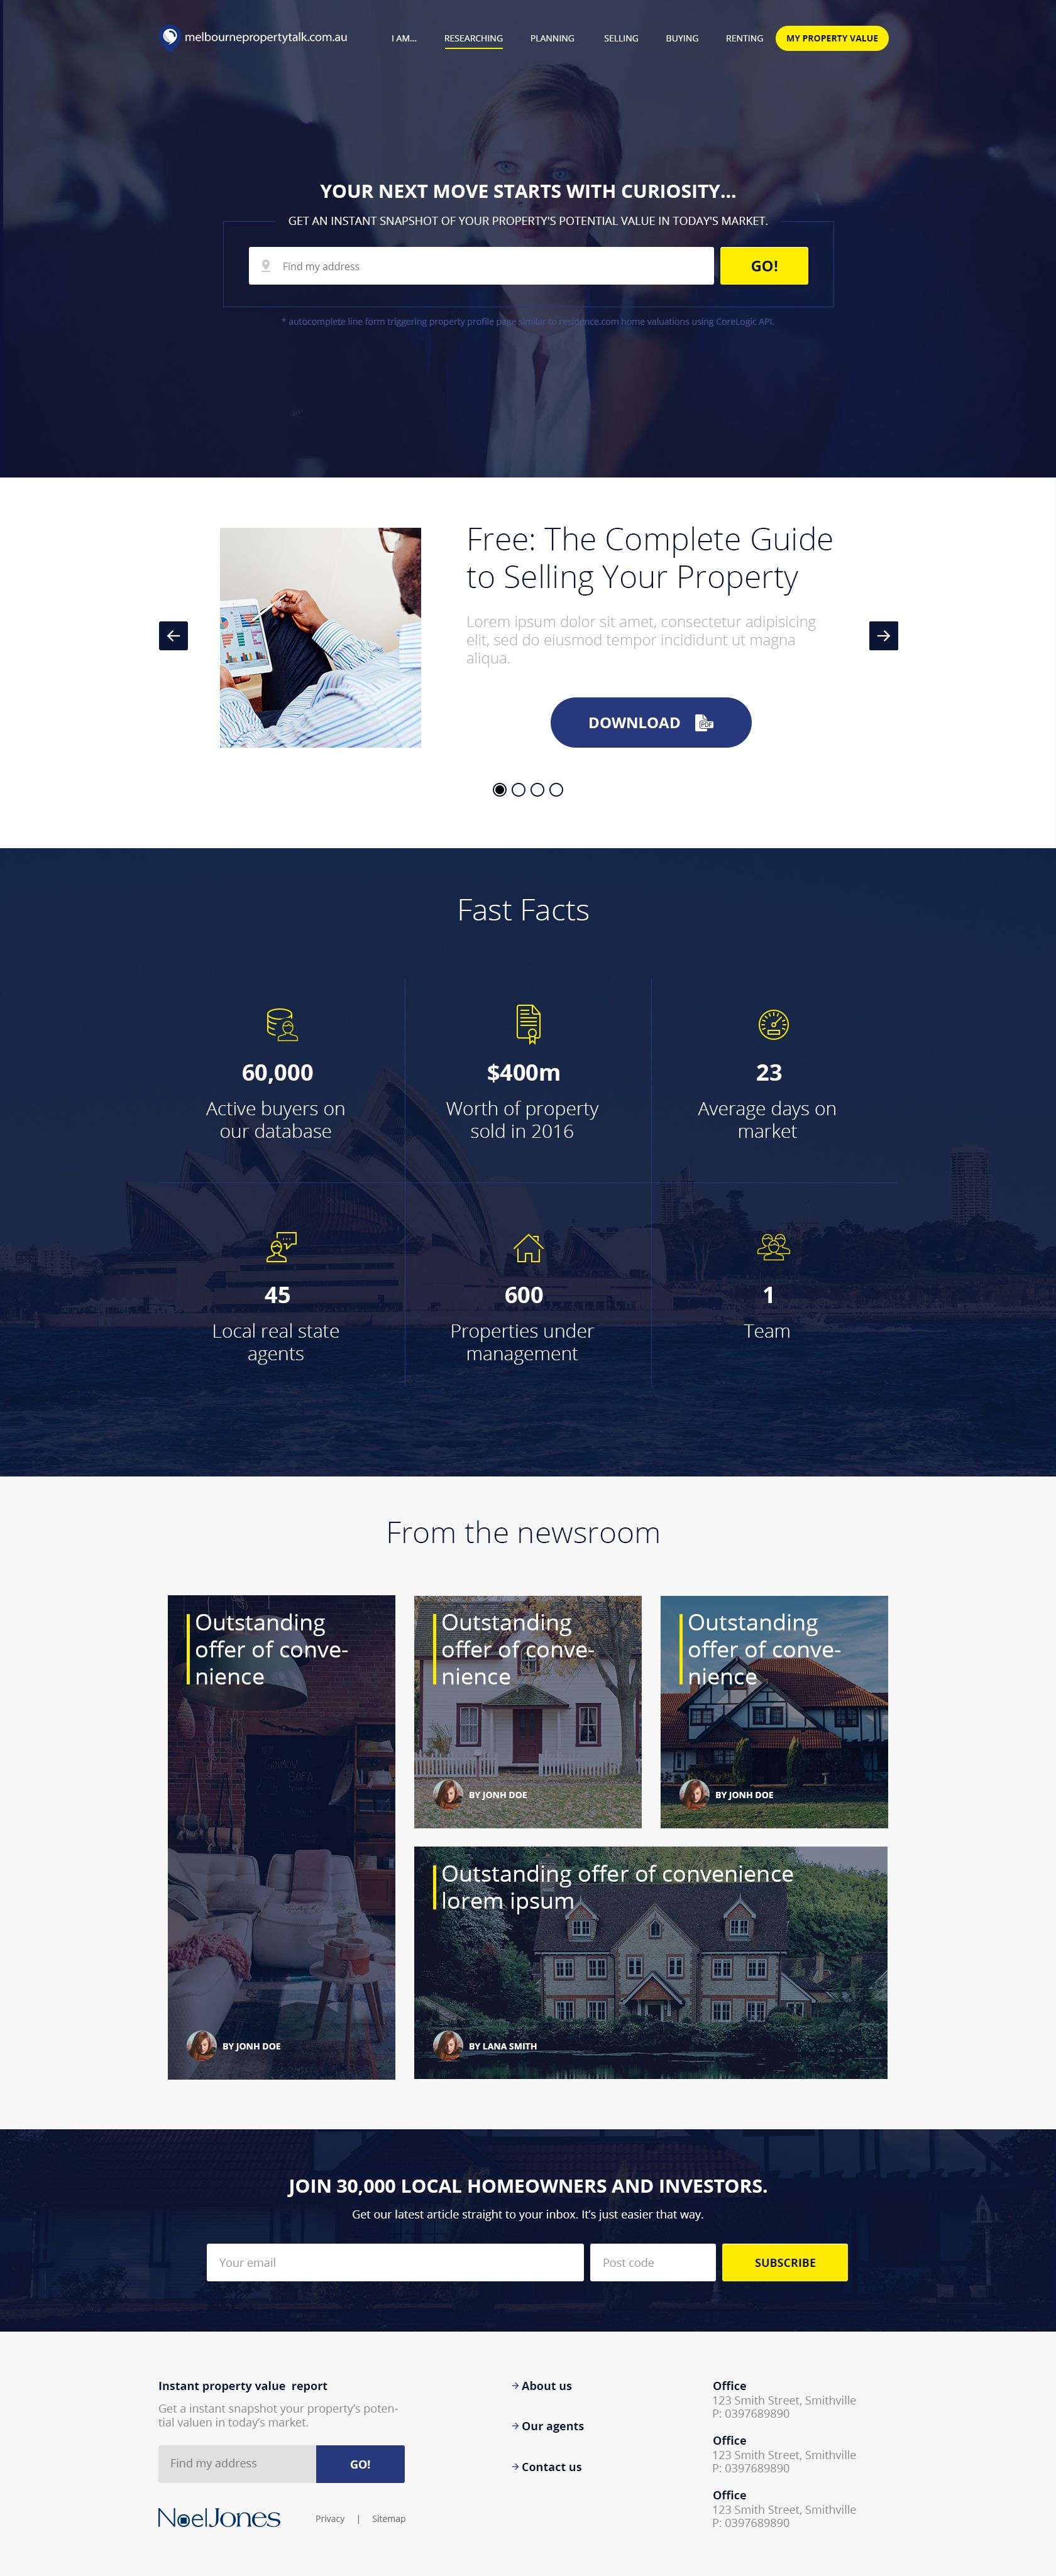 Design 62 By Chandzul Create A Modern Homepage Design For An Established Real Estate Agency In Melbourne Homepage Design Database Marketing Web Inspiration